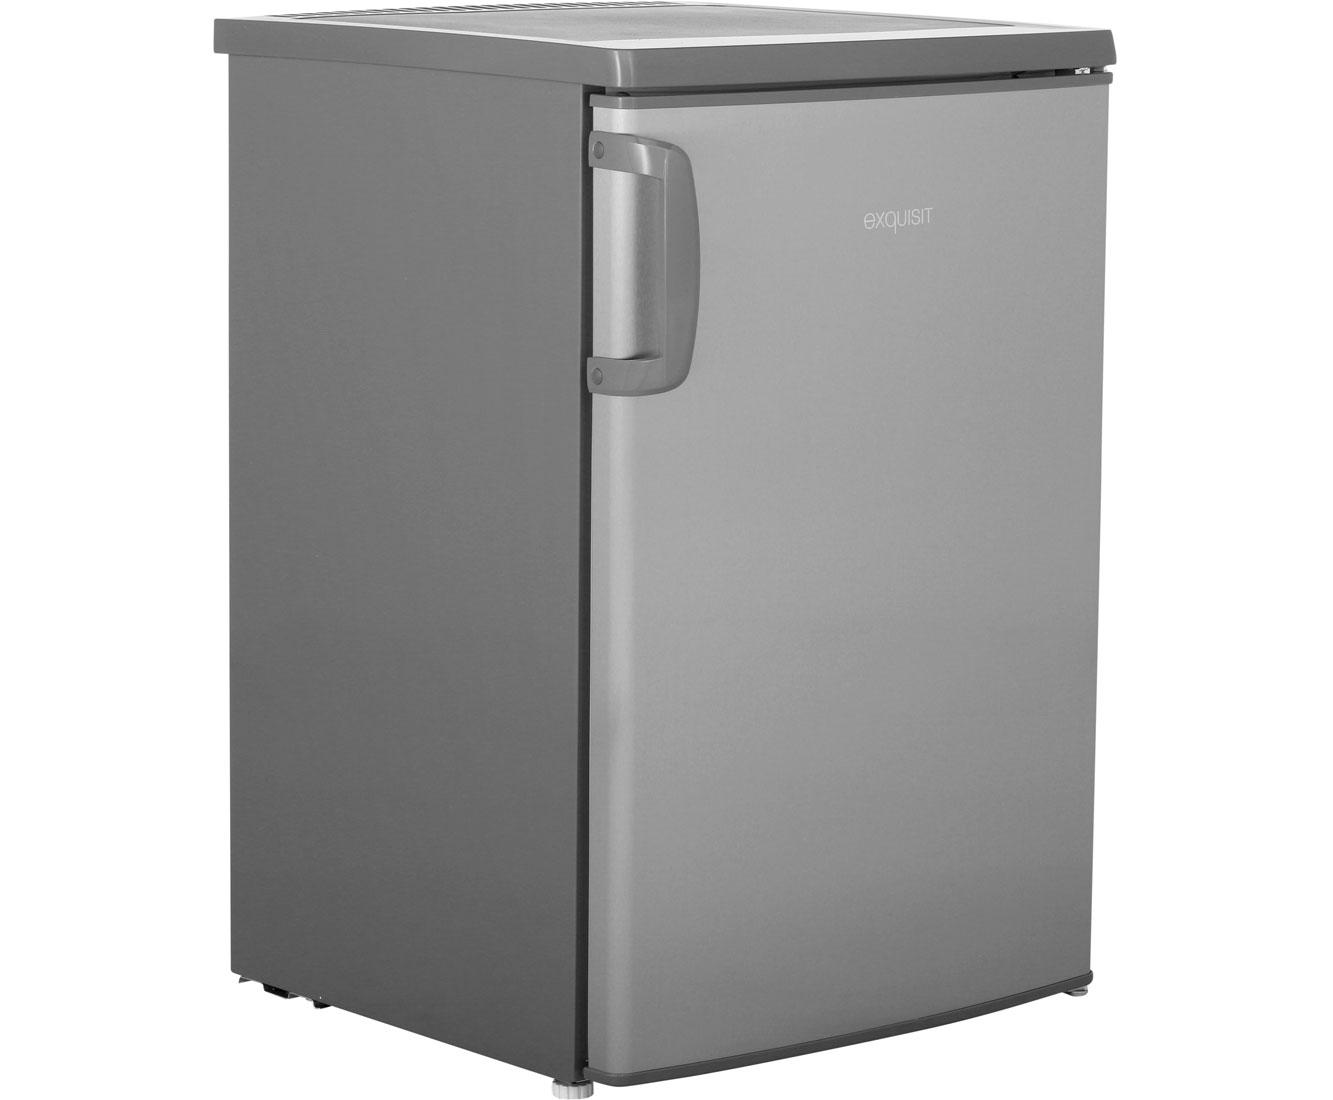 Exquisit KS 15-5 A+++ Kühlschrank Freistehend 54cm